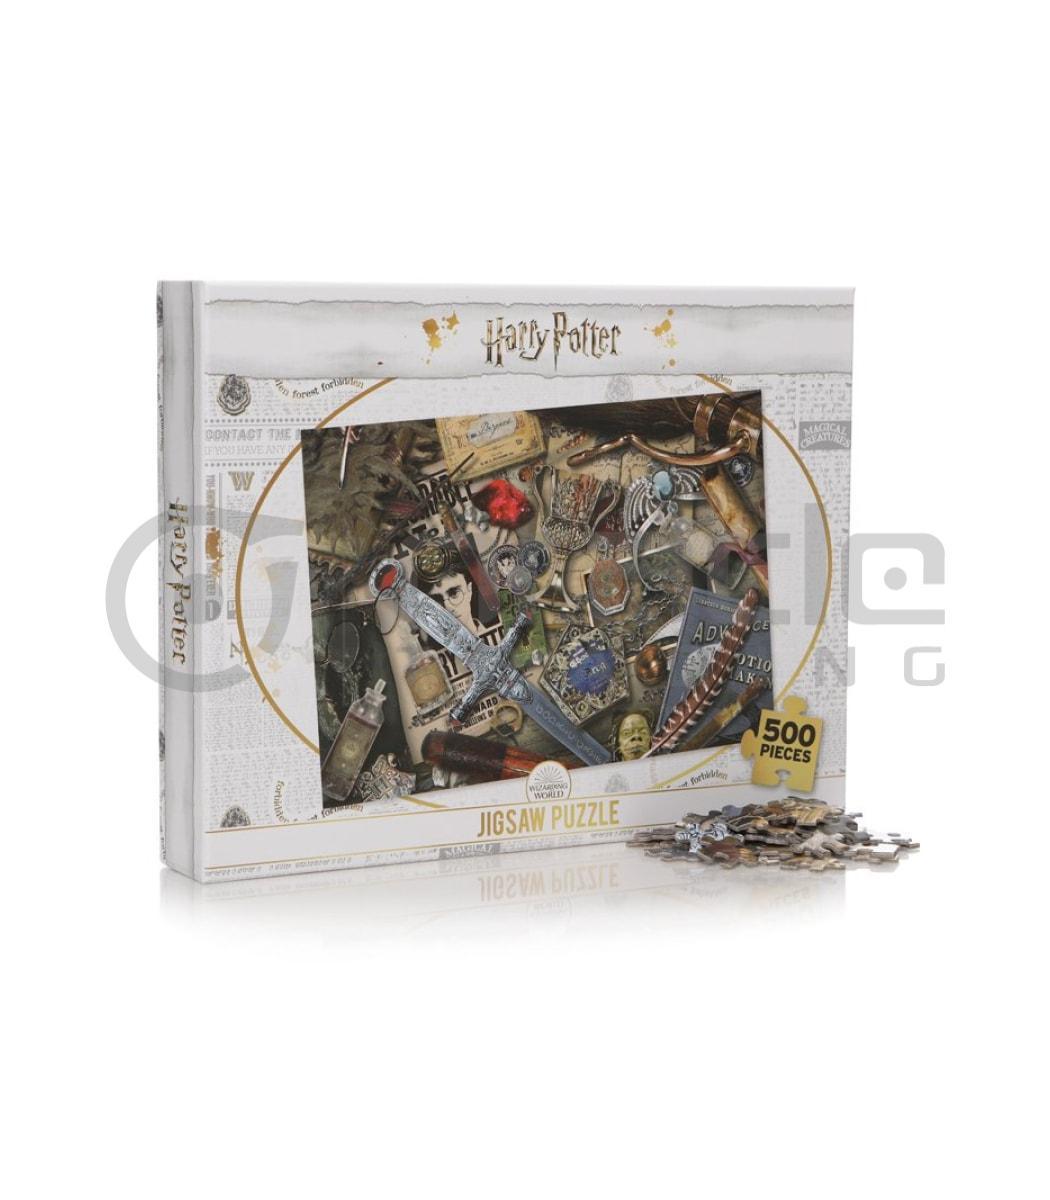 Harry Potter Jigsaw Puzzle - Horcruxes